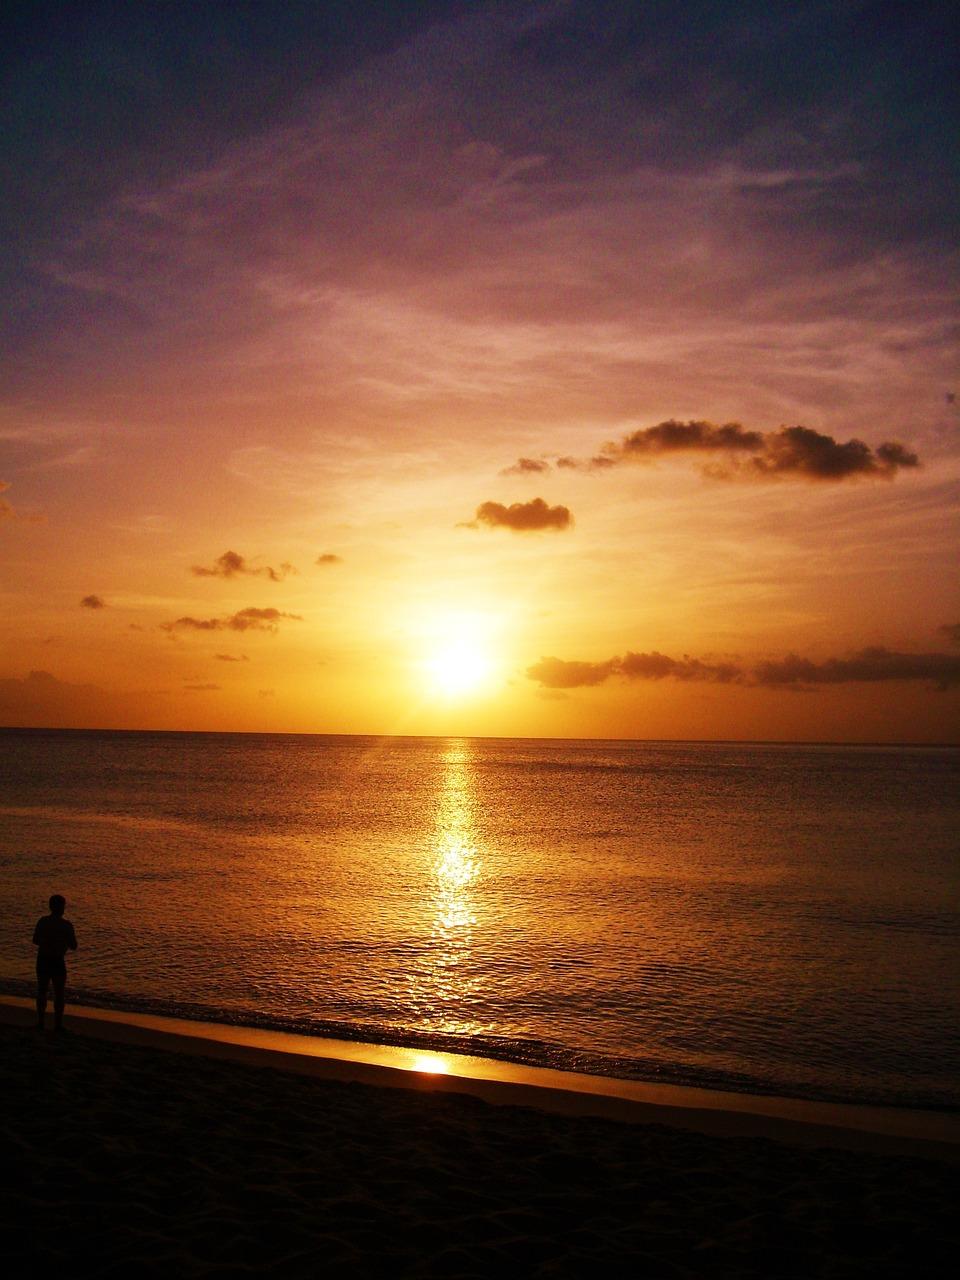 картинки про закат на море своему